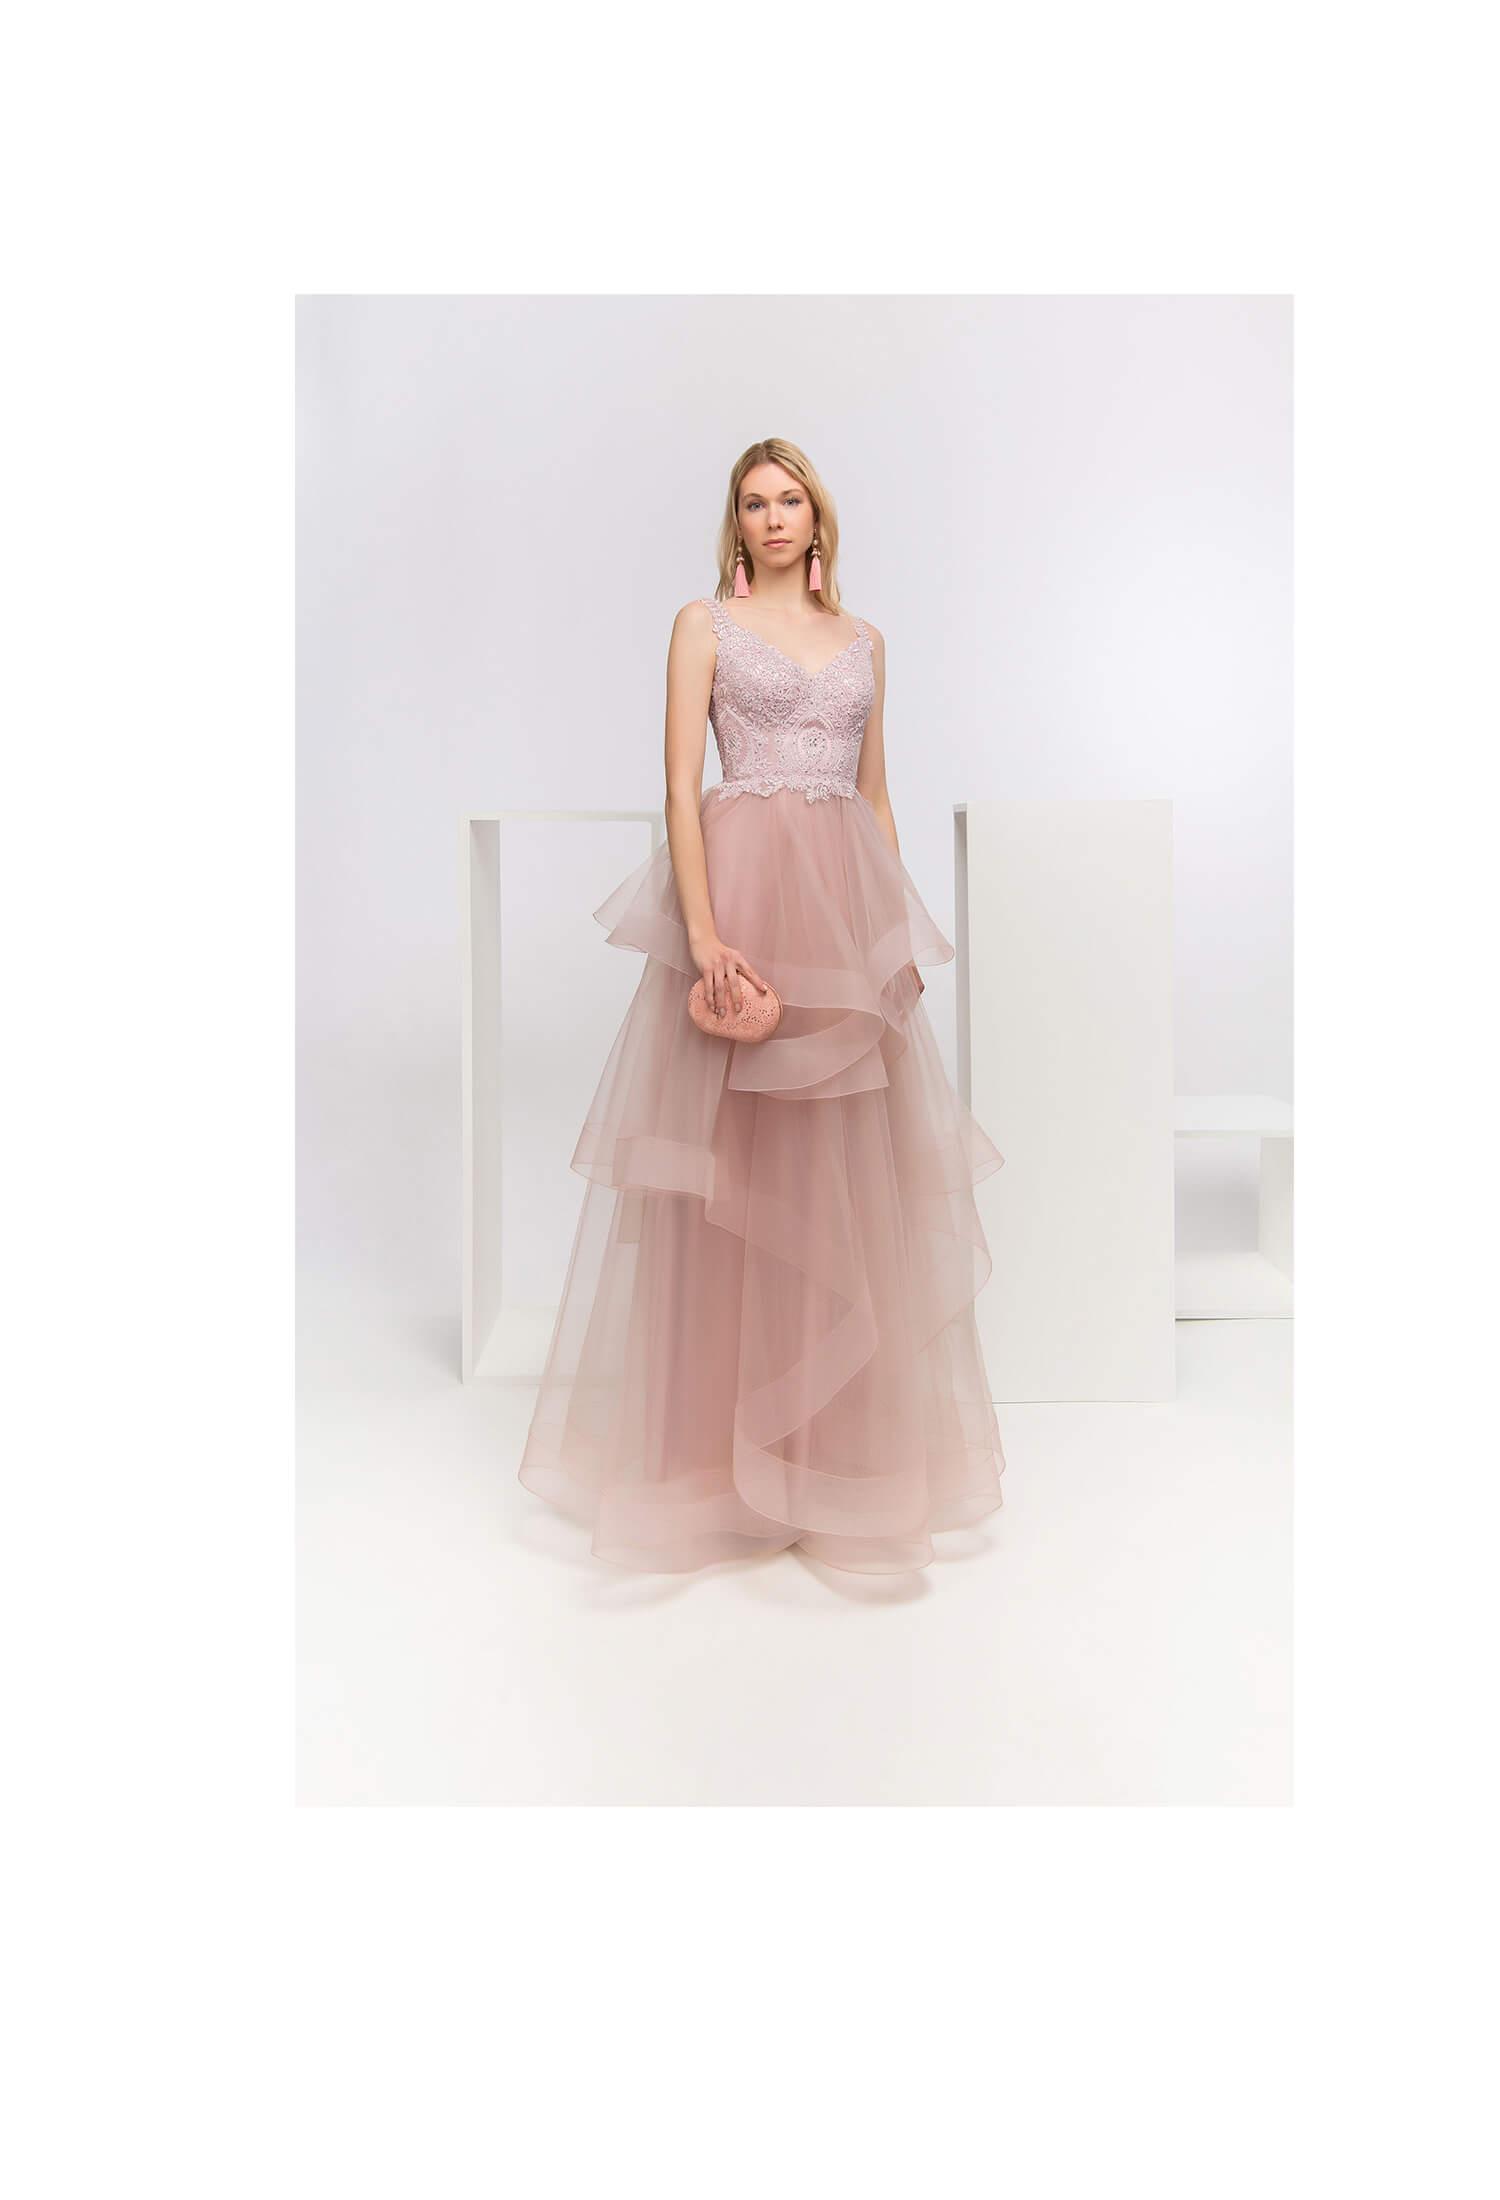 Romantische roze jurk